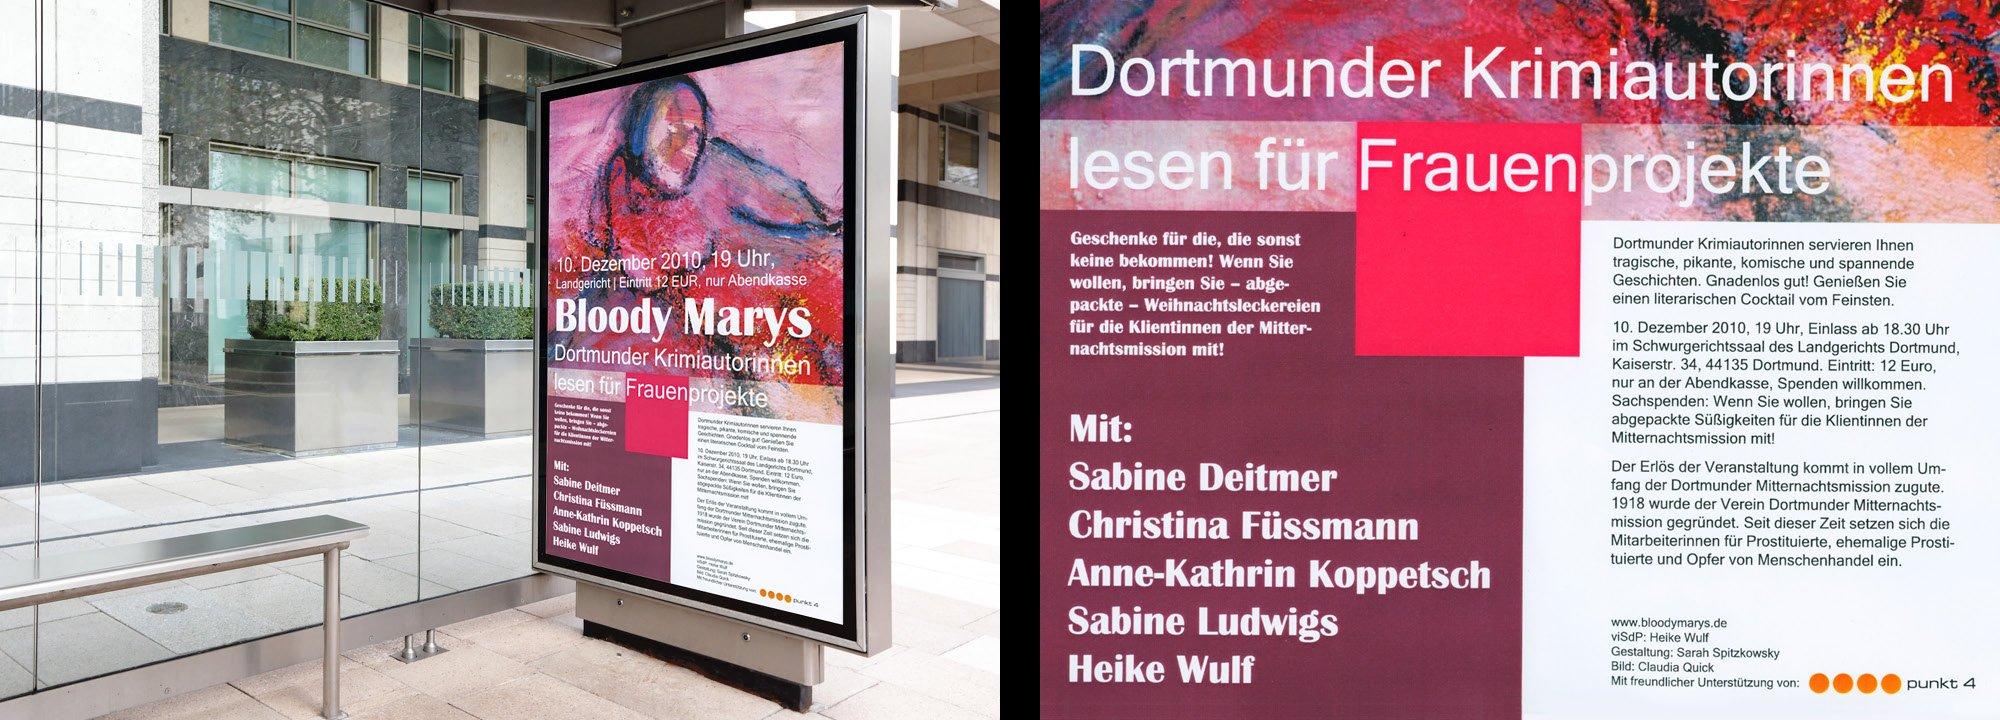 Sponsoring Dortmunder Krimiautorinnen 2010